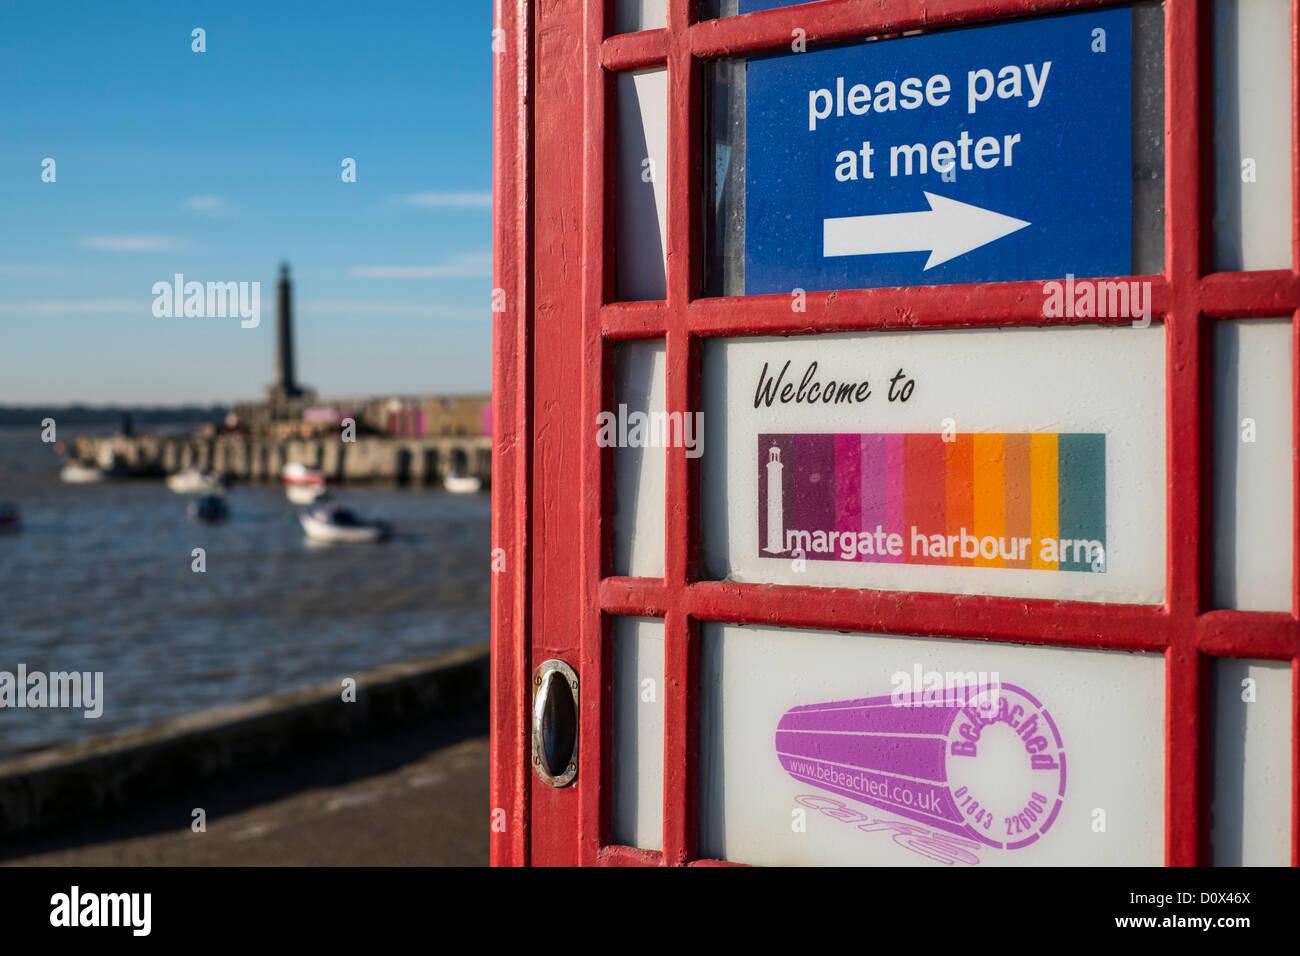 Red Public Telephone Kiosk Advertising 'The Harbour Arm' Margate, Kent, UK. - Stock Image